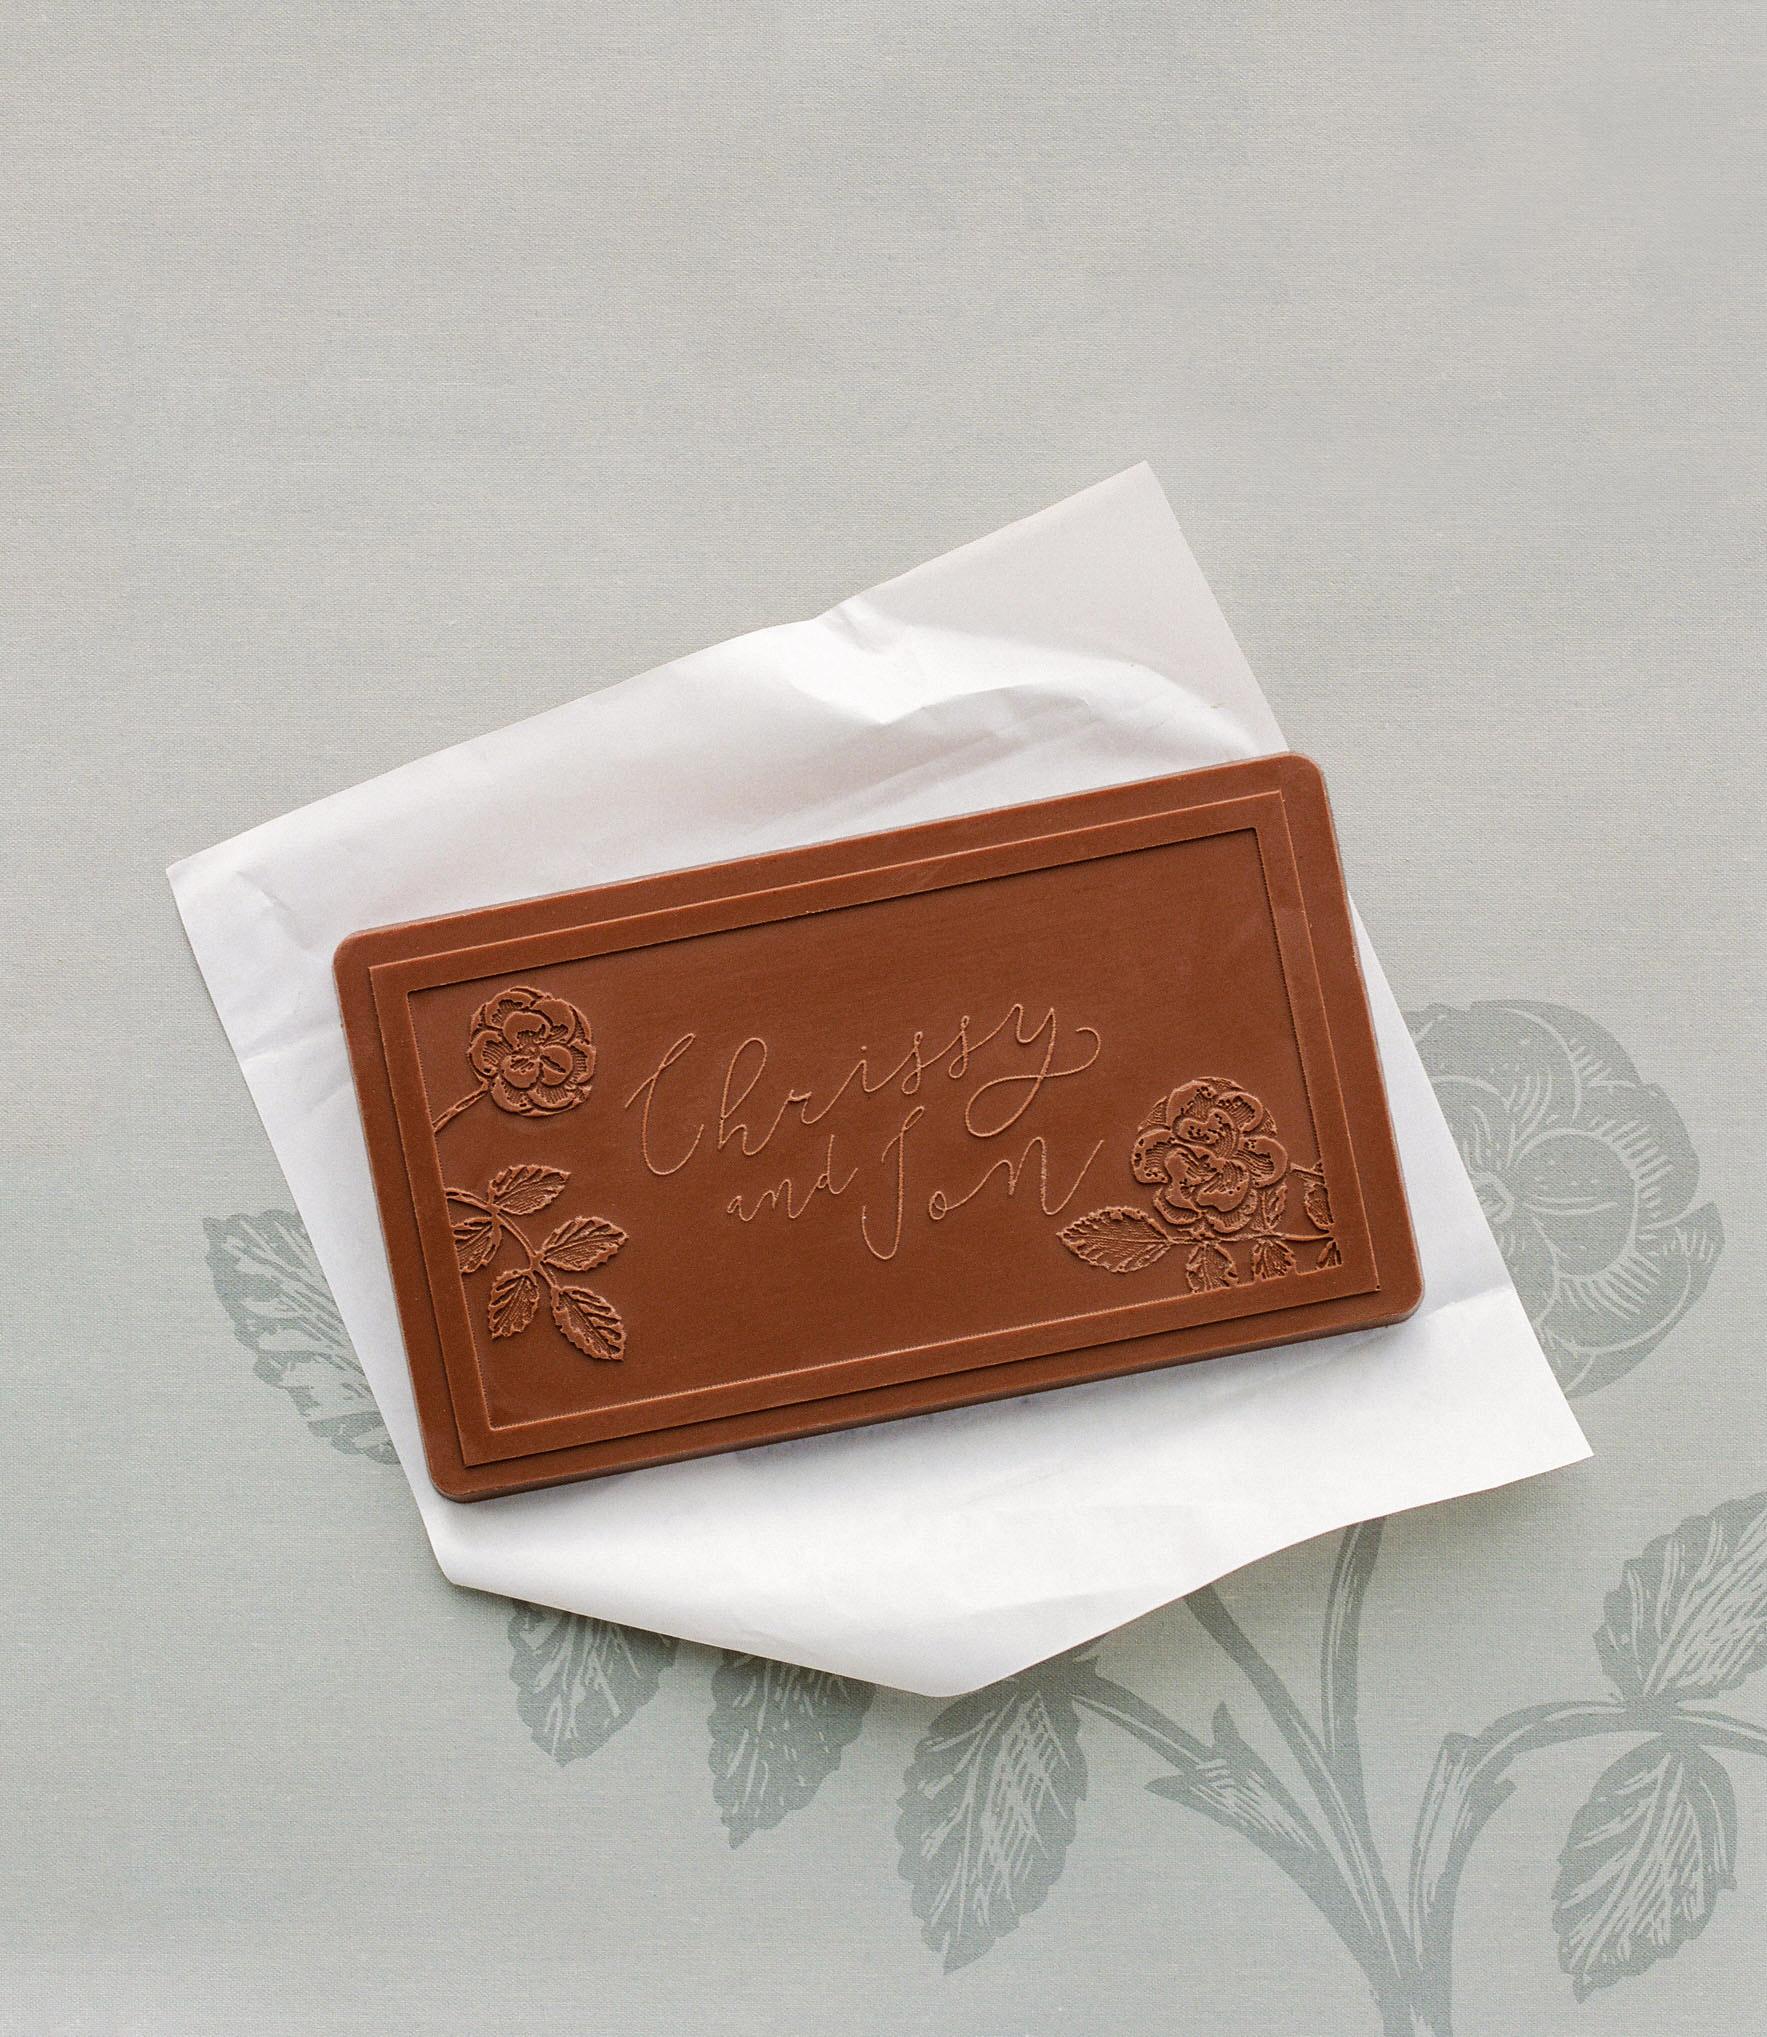 chrissy jon wedding chocolate favor